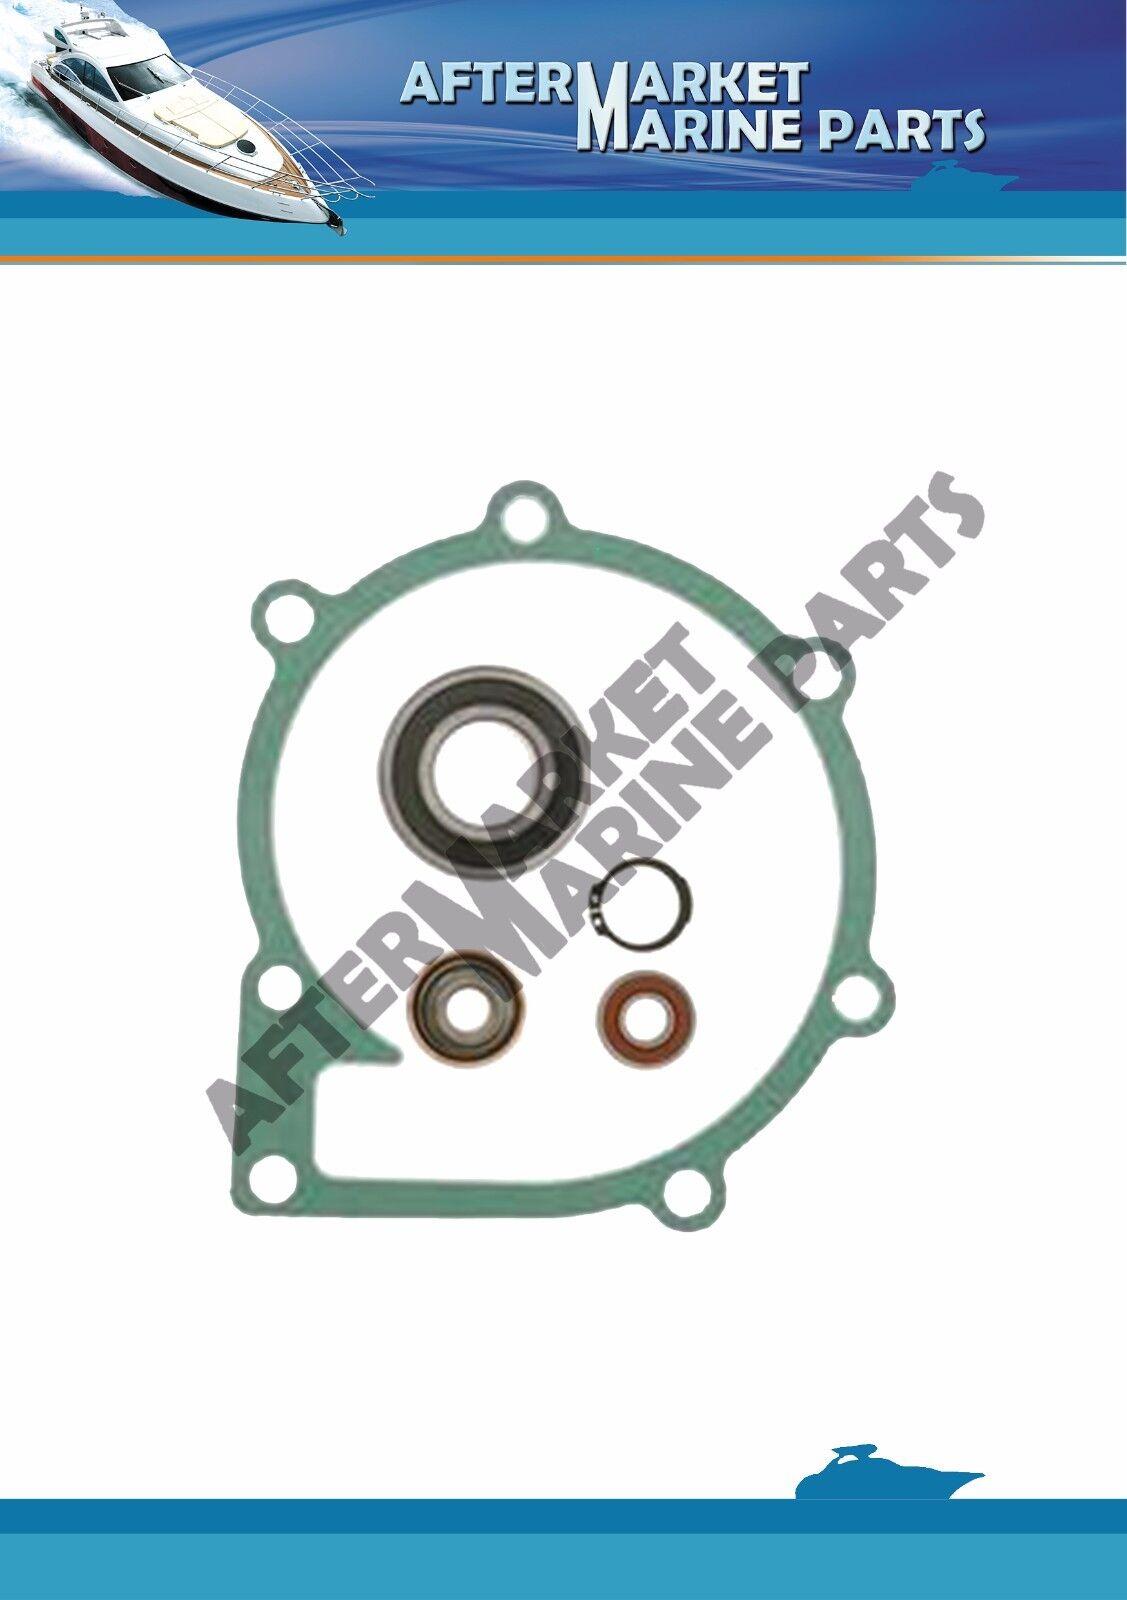 Volvo D41 D42 D43 D44 Umwälzpumpe Reparaturset Ähnlich wie 876794 876544